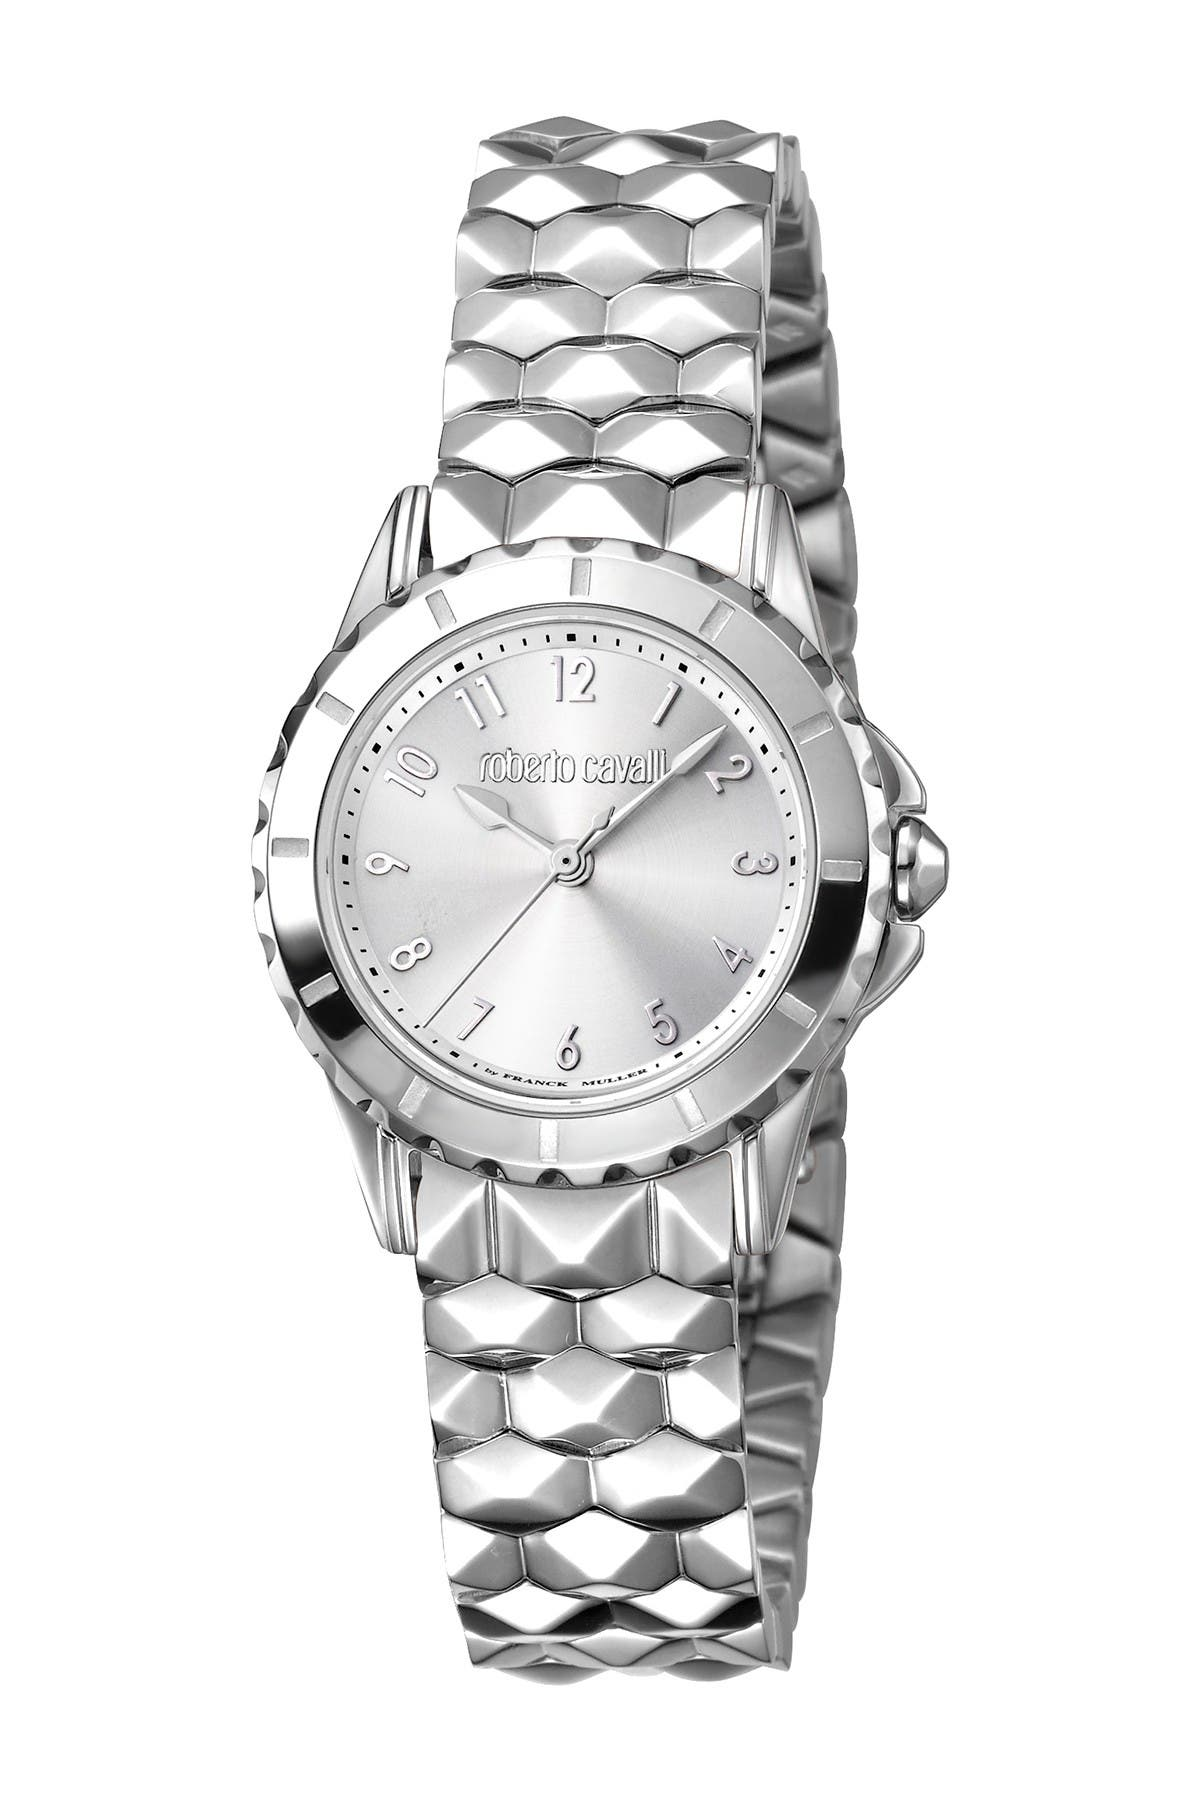 Image of Roberto Cavalli Women's Silver Dial Stainless Steel Bracelet Watch, 28mm